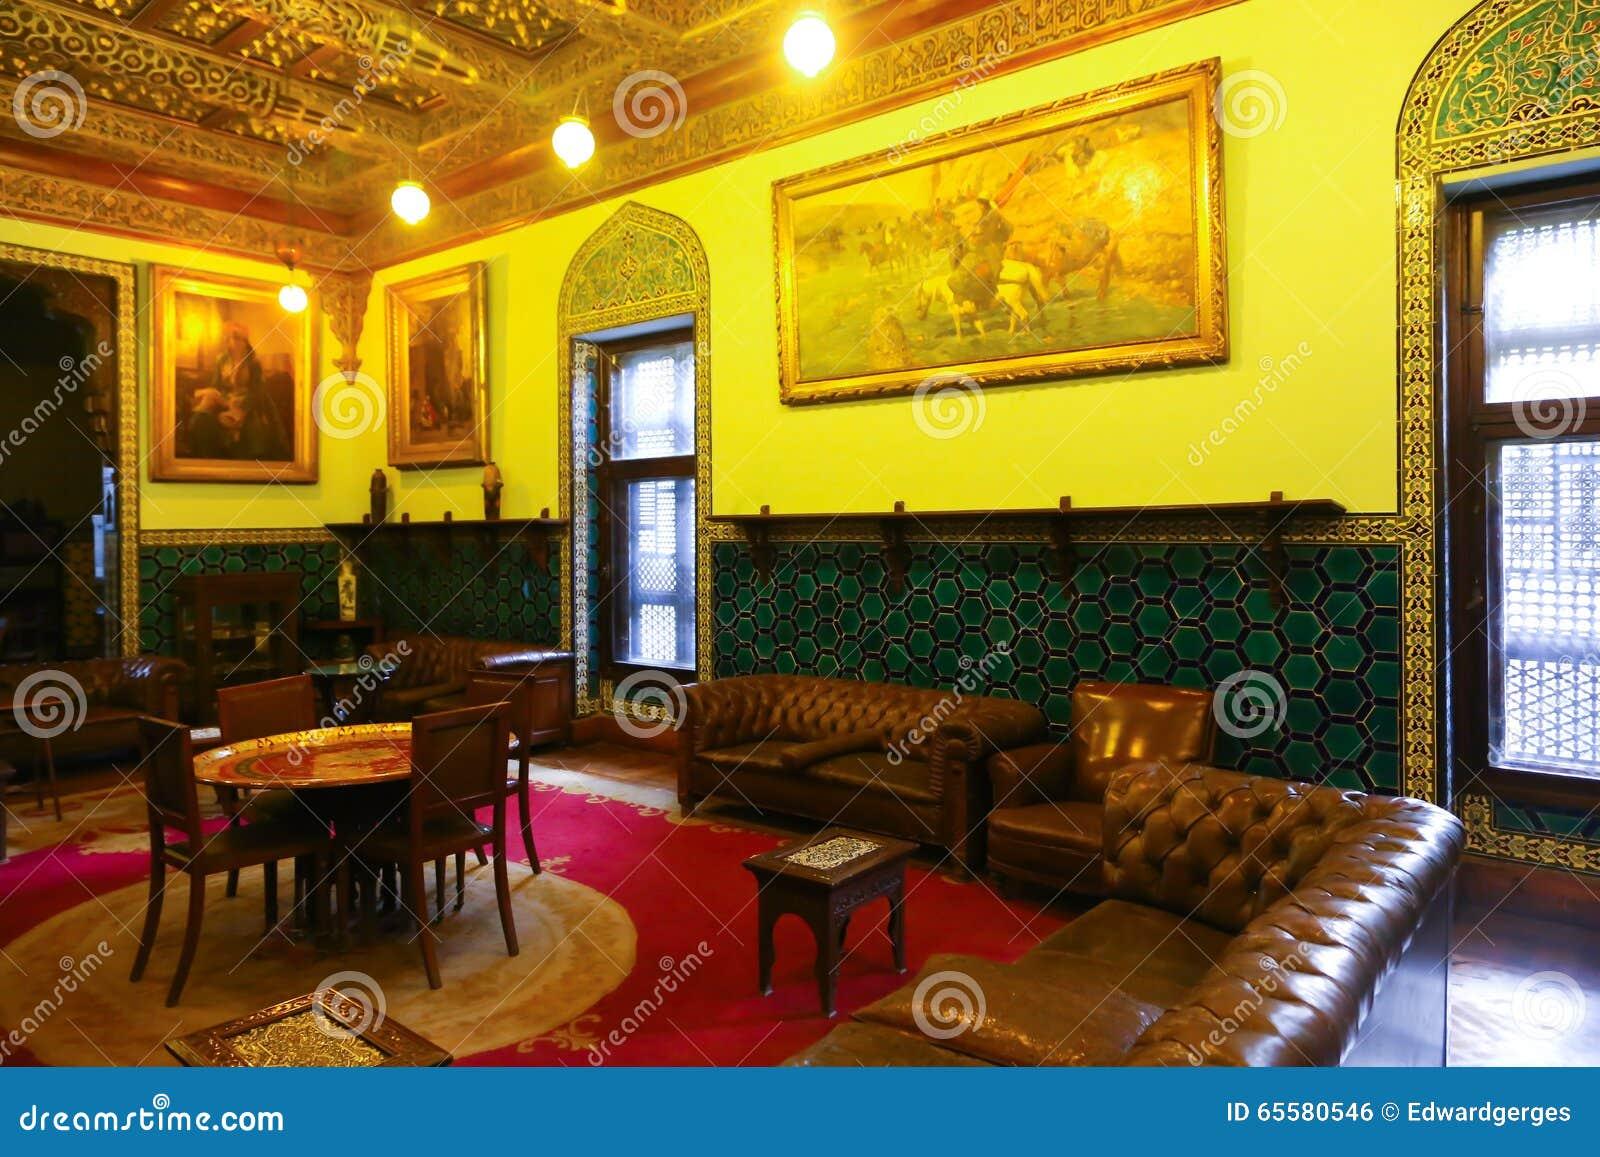 Mohammed Ali Palace